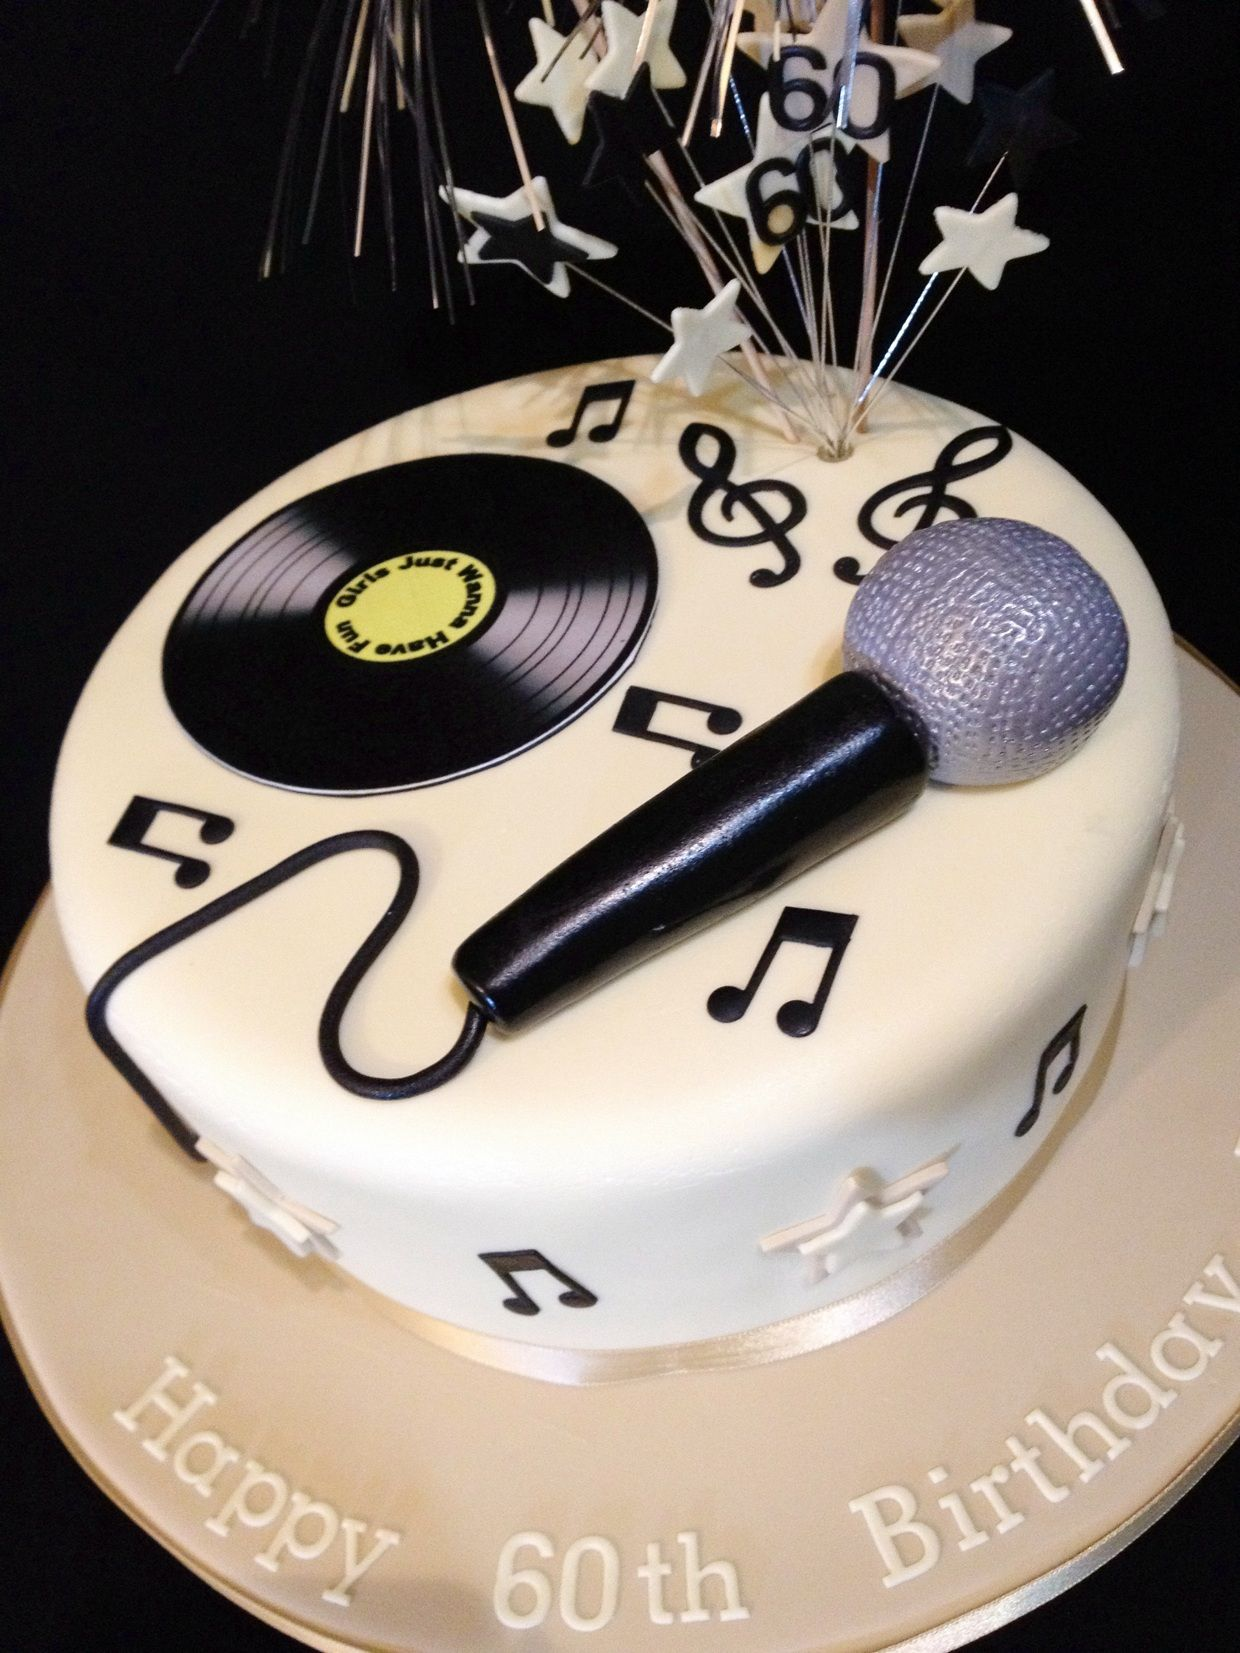 Enjoyable Karaoke Cake Music Birthday Cakes Music Themed Cakes Funny Birthday Cards Online Aeocydamsfinfo